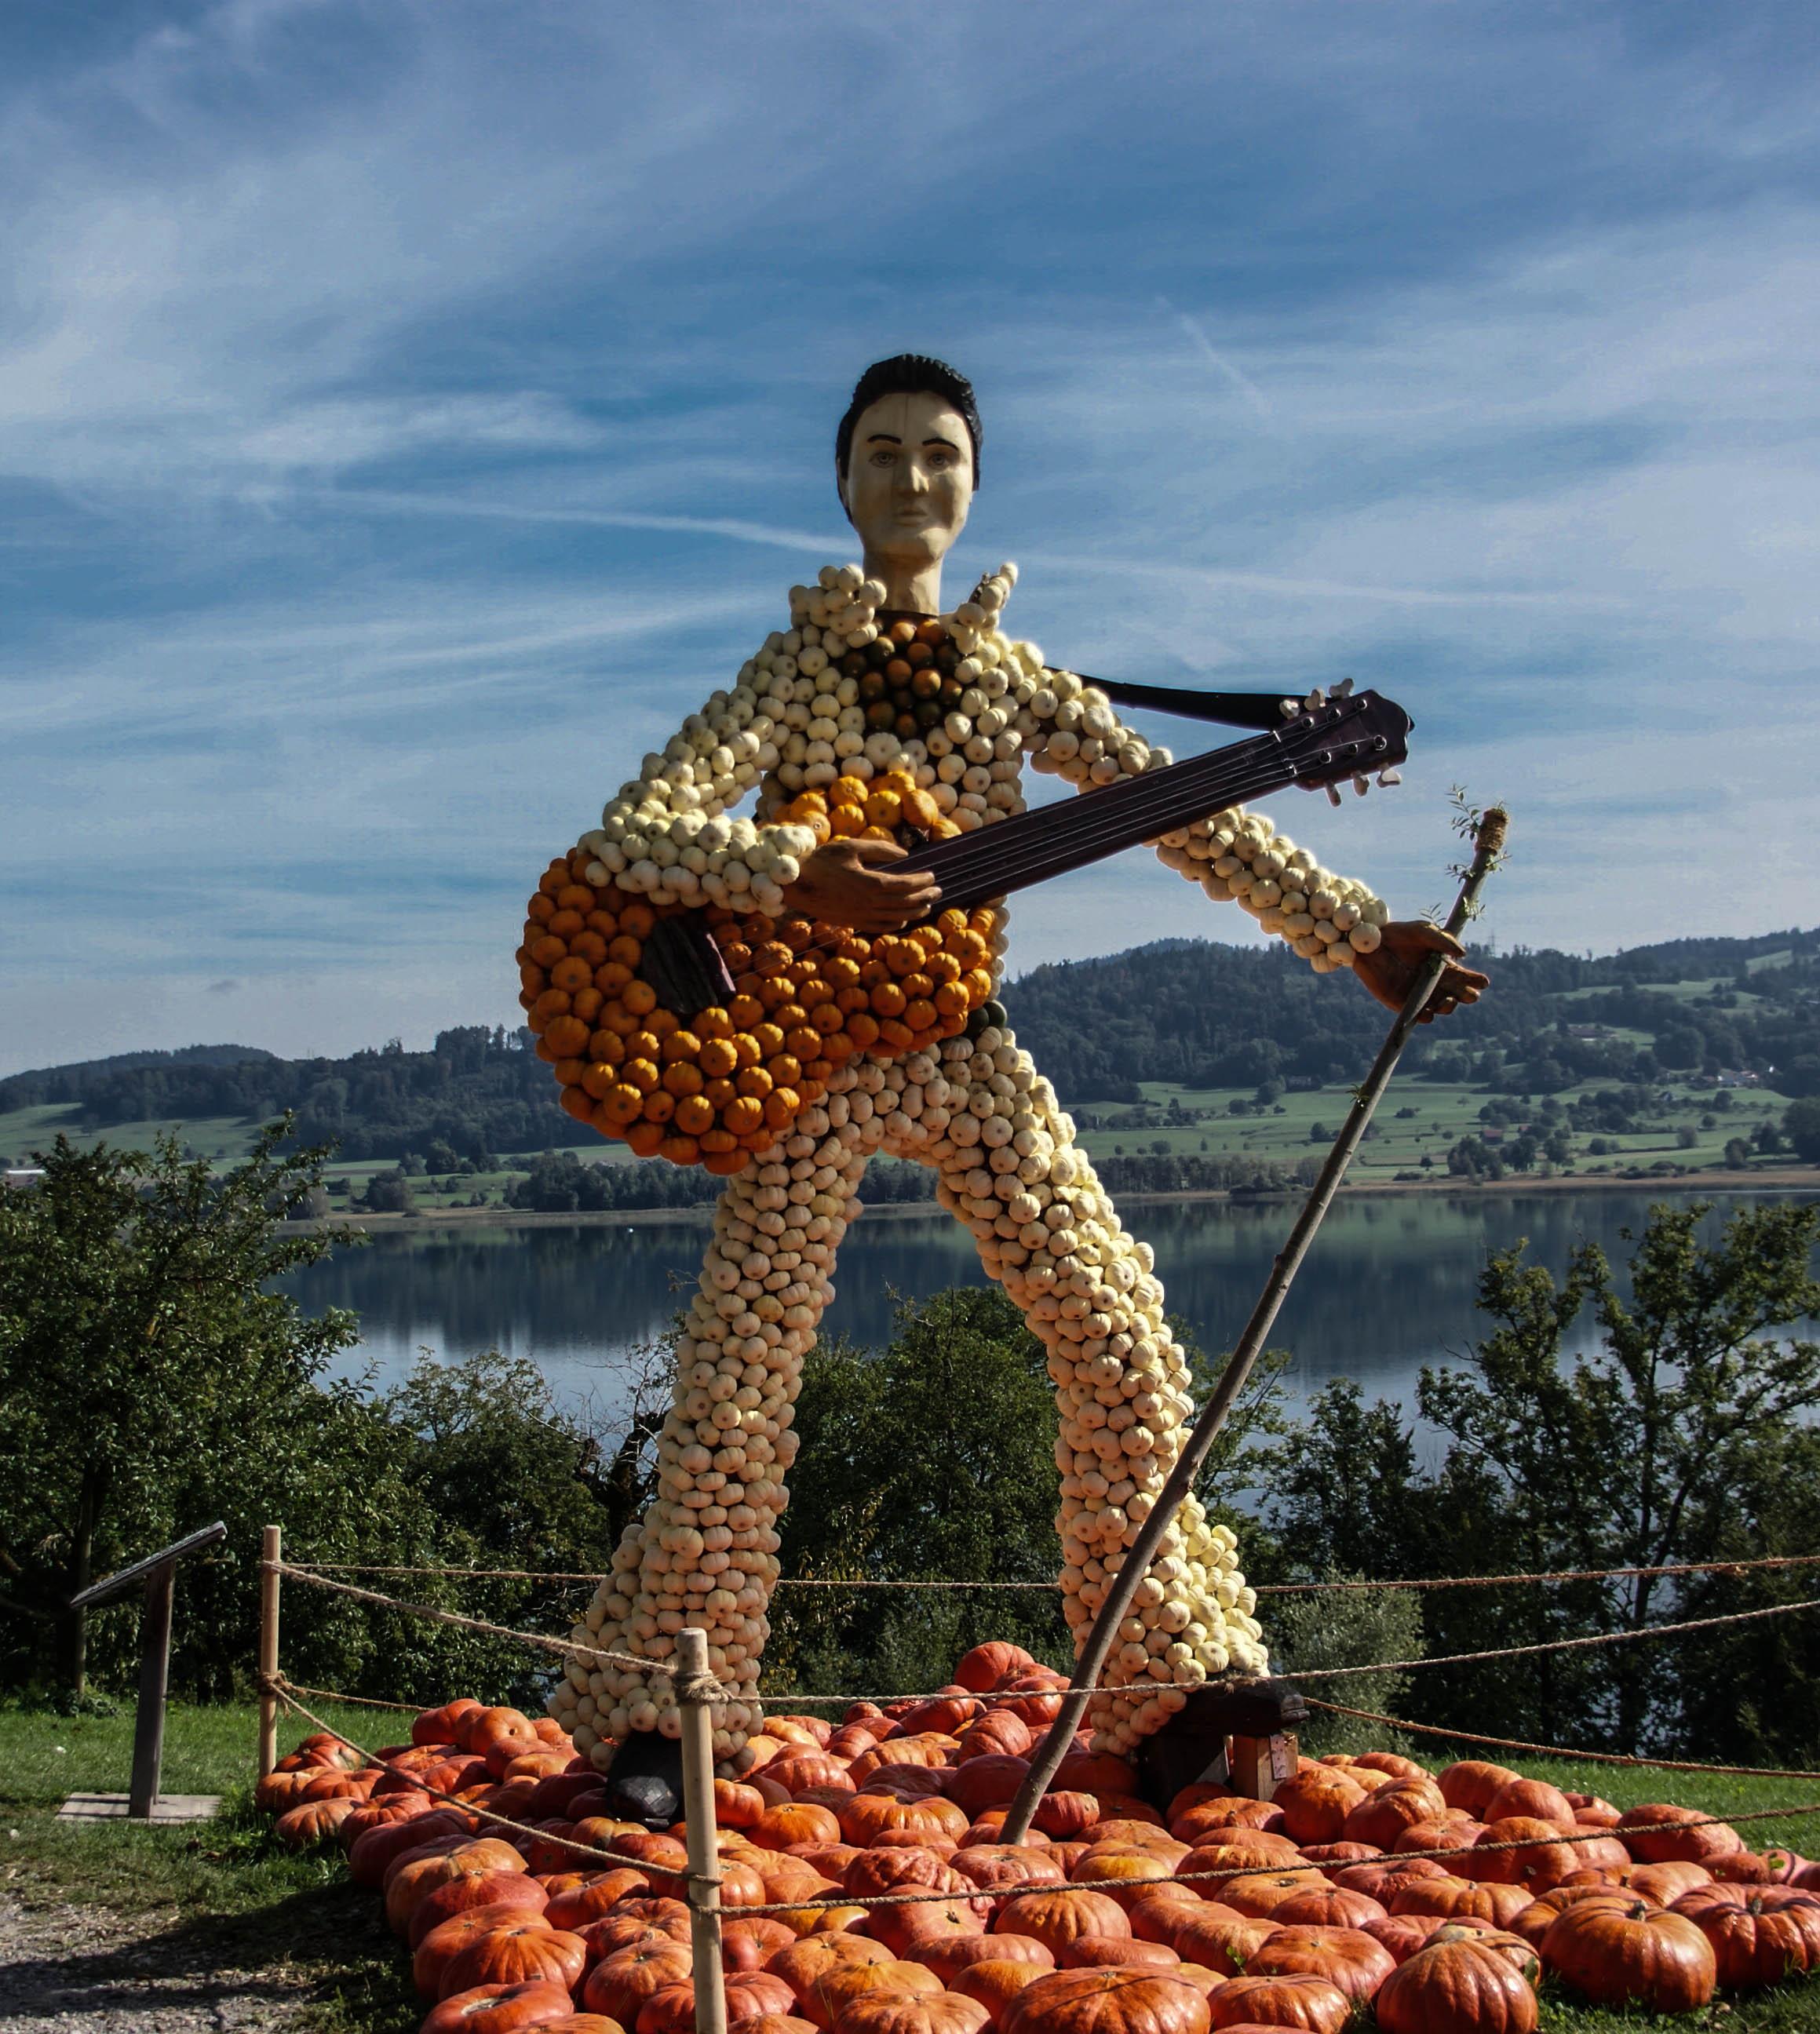 Elvis visits the farm!